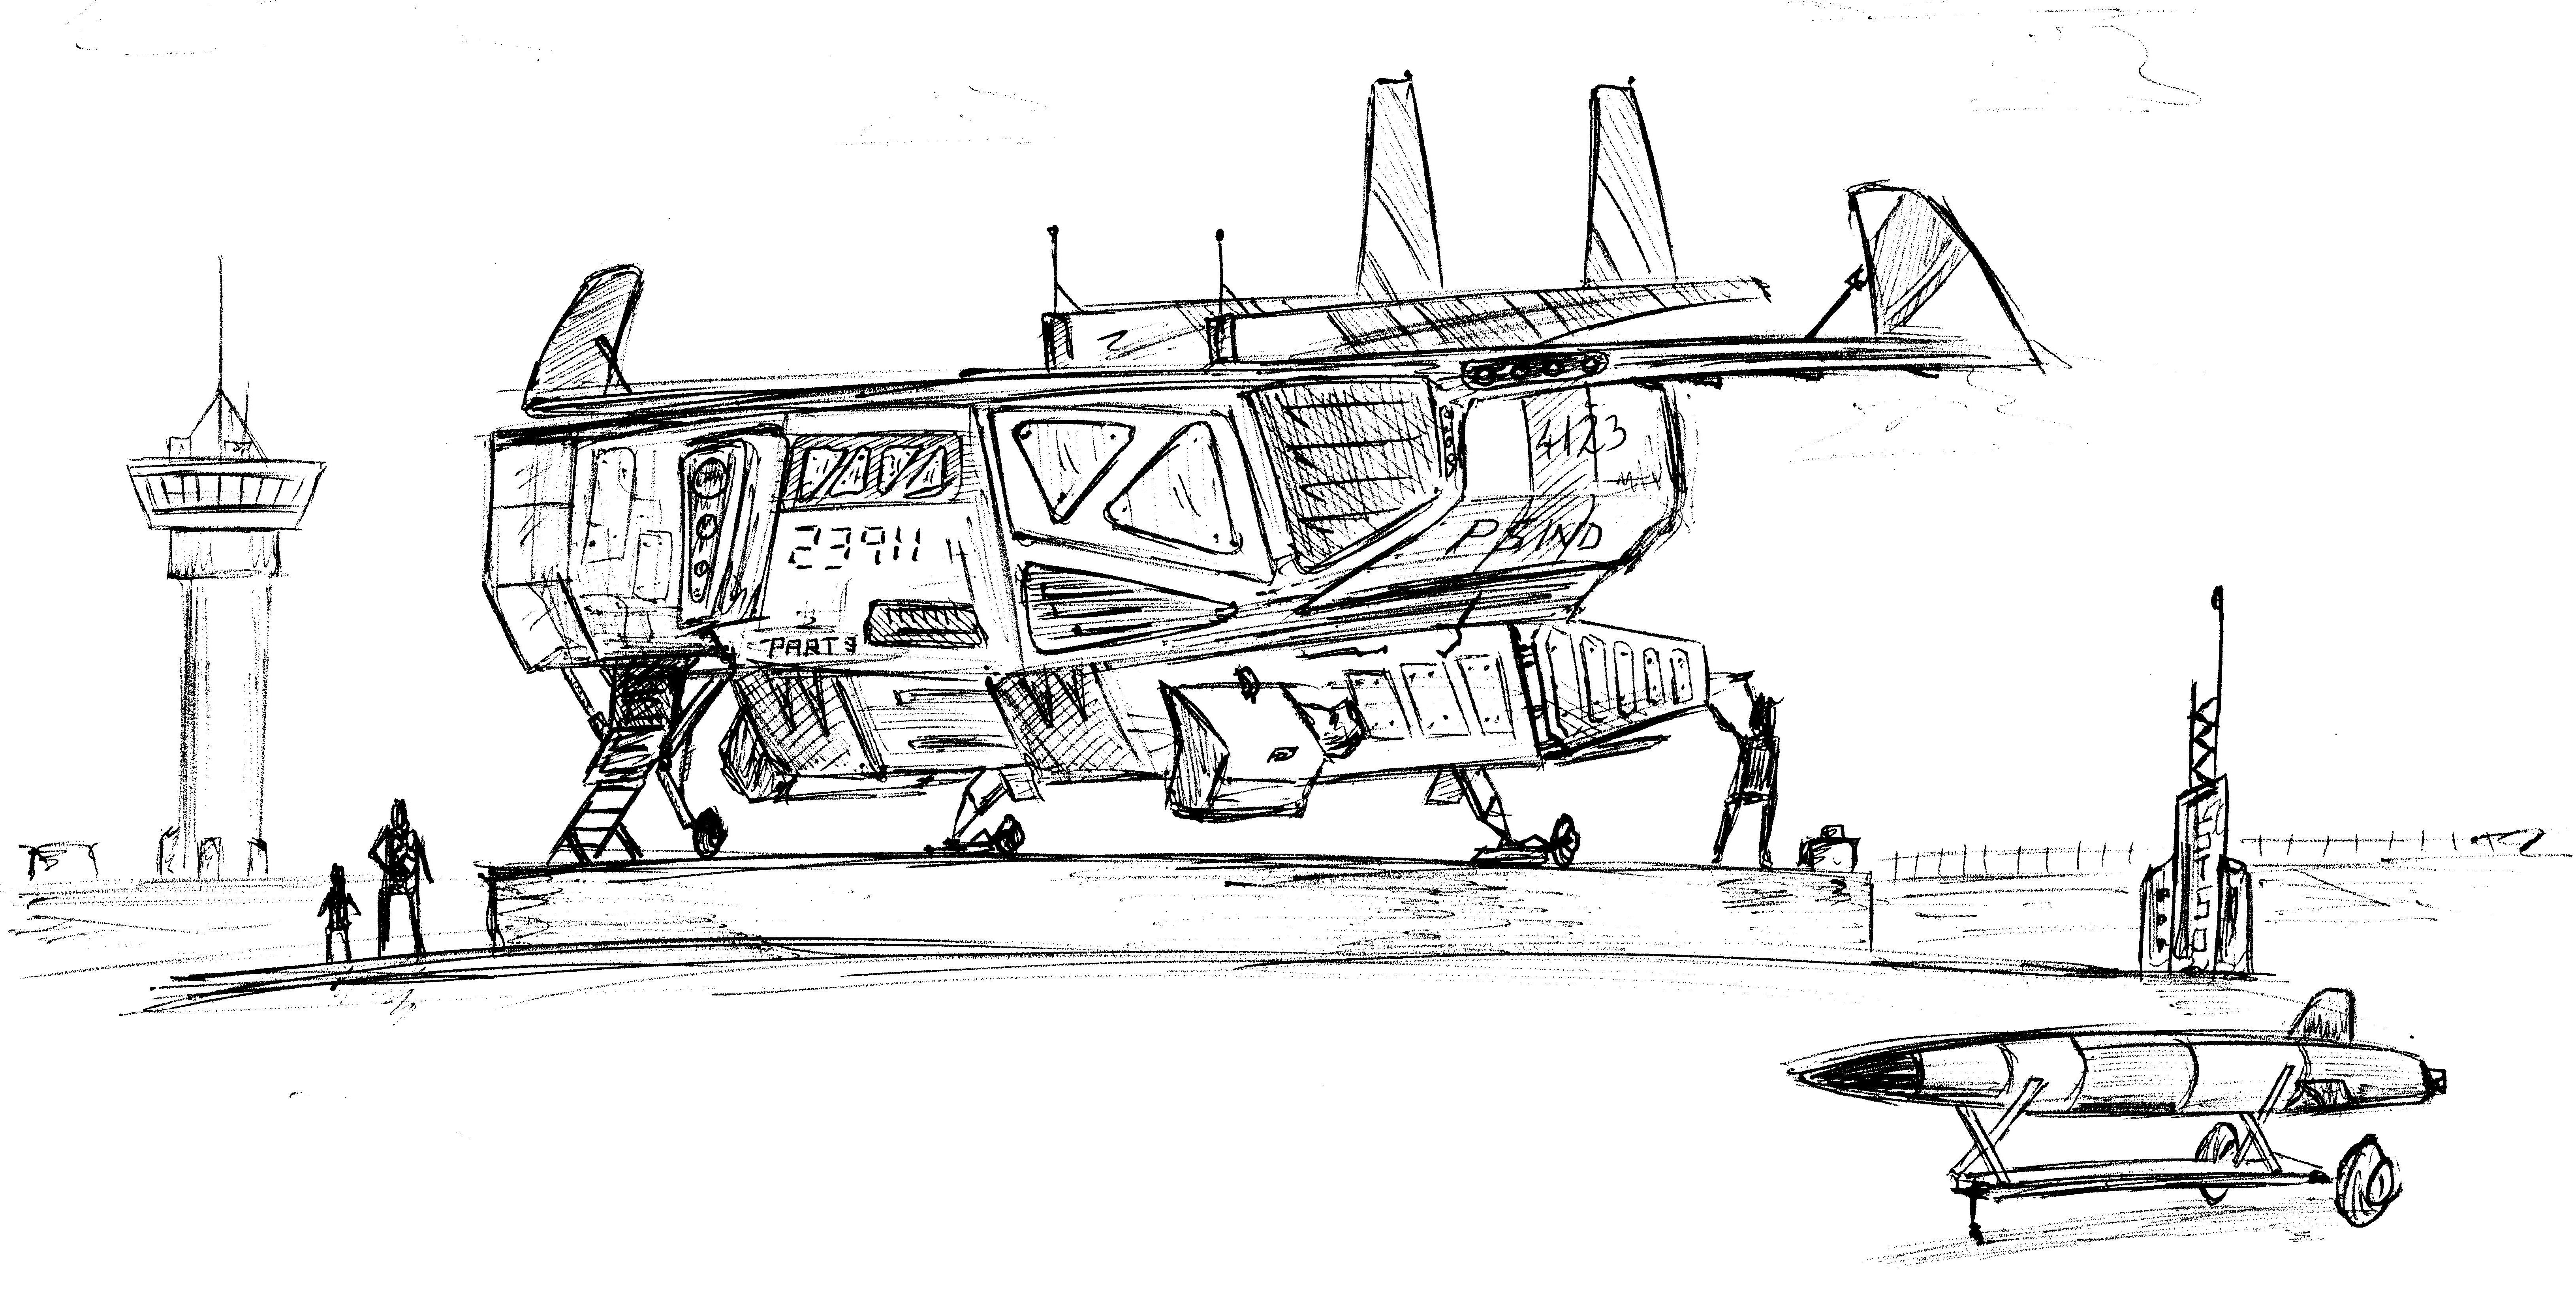 sci-fi Gunship Sketch